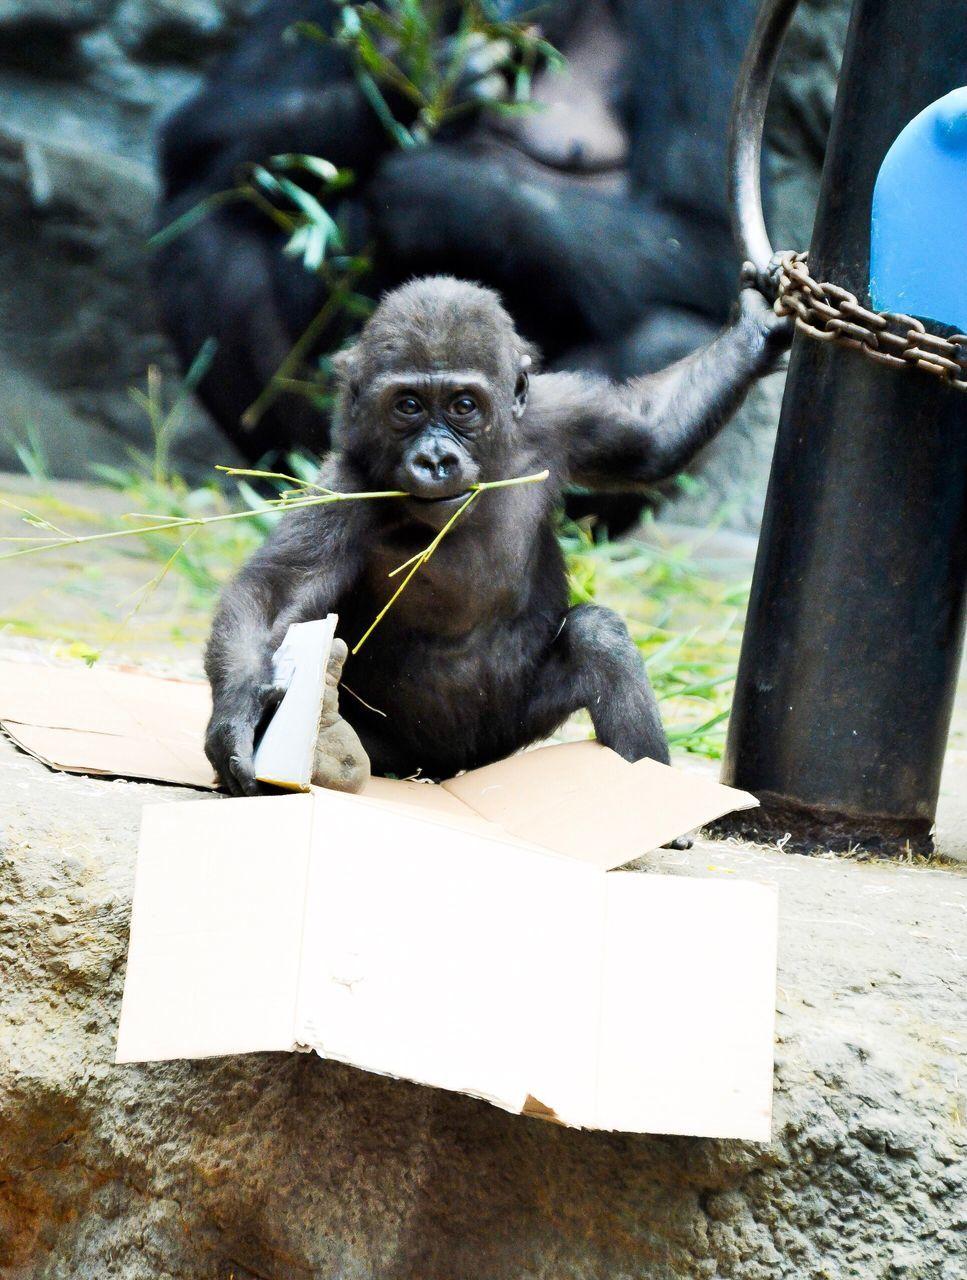 Portrait Of Infant Gorilla Sitting Outdoors